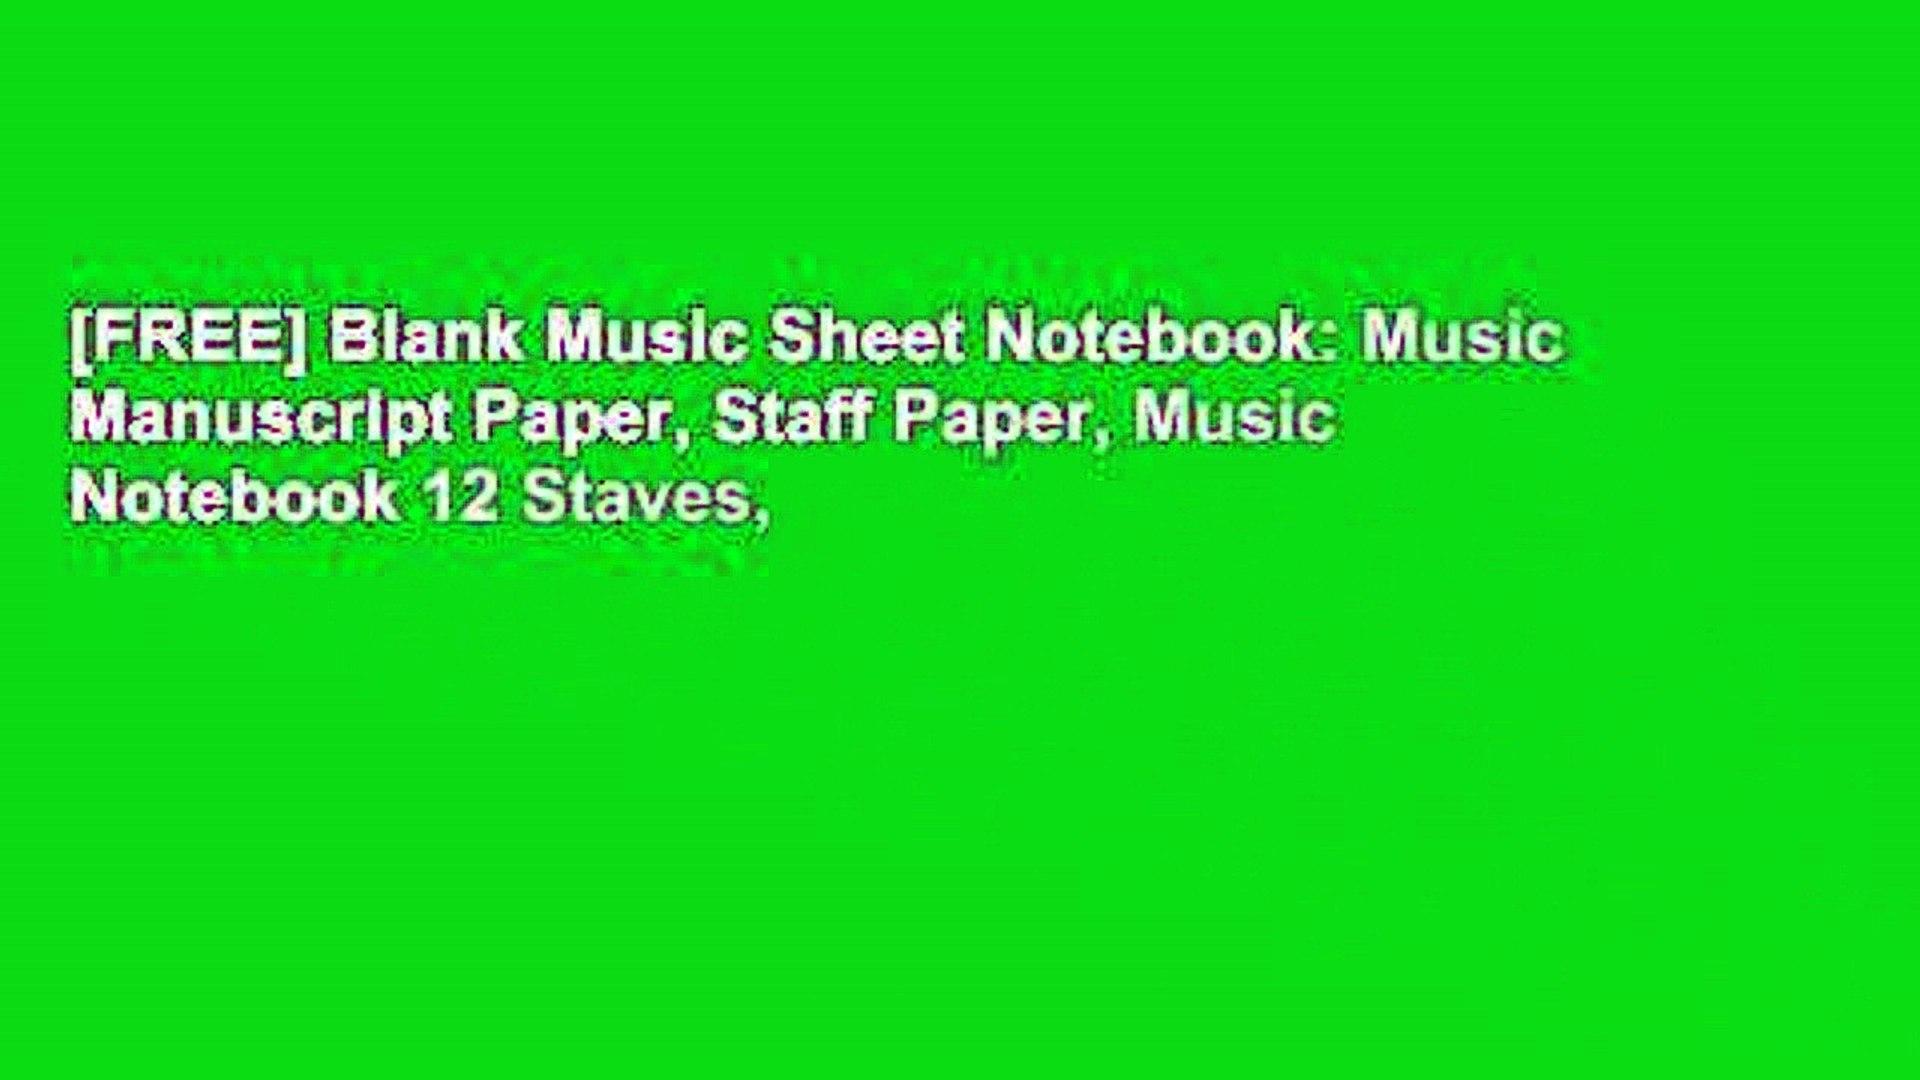 [FREE] Blank Music Sheet Notebook: Music Manuscript Paper, Staff Paper, Music Notebook 12 Staves,